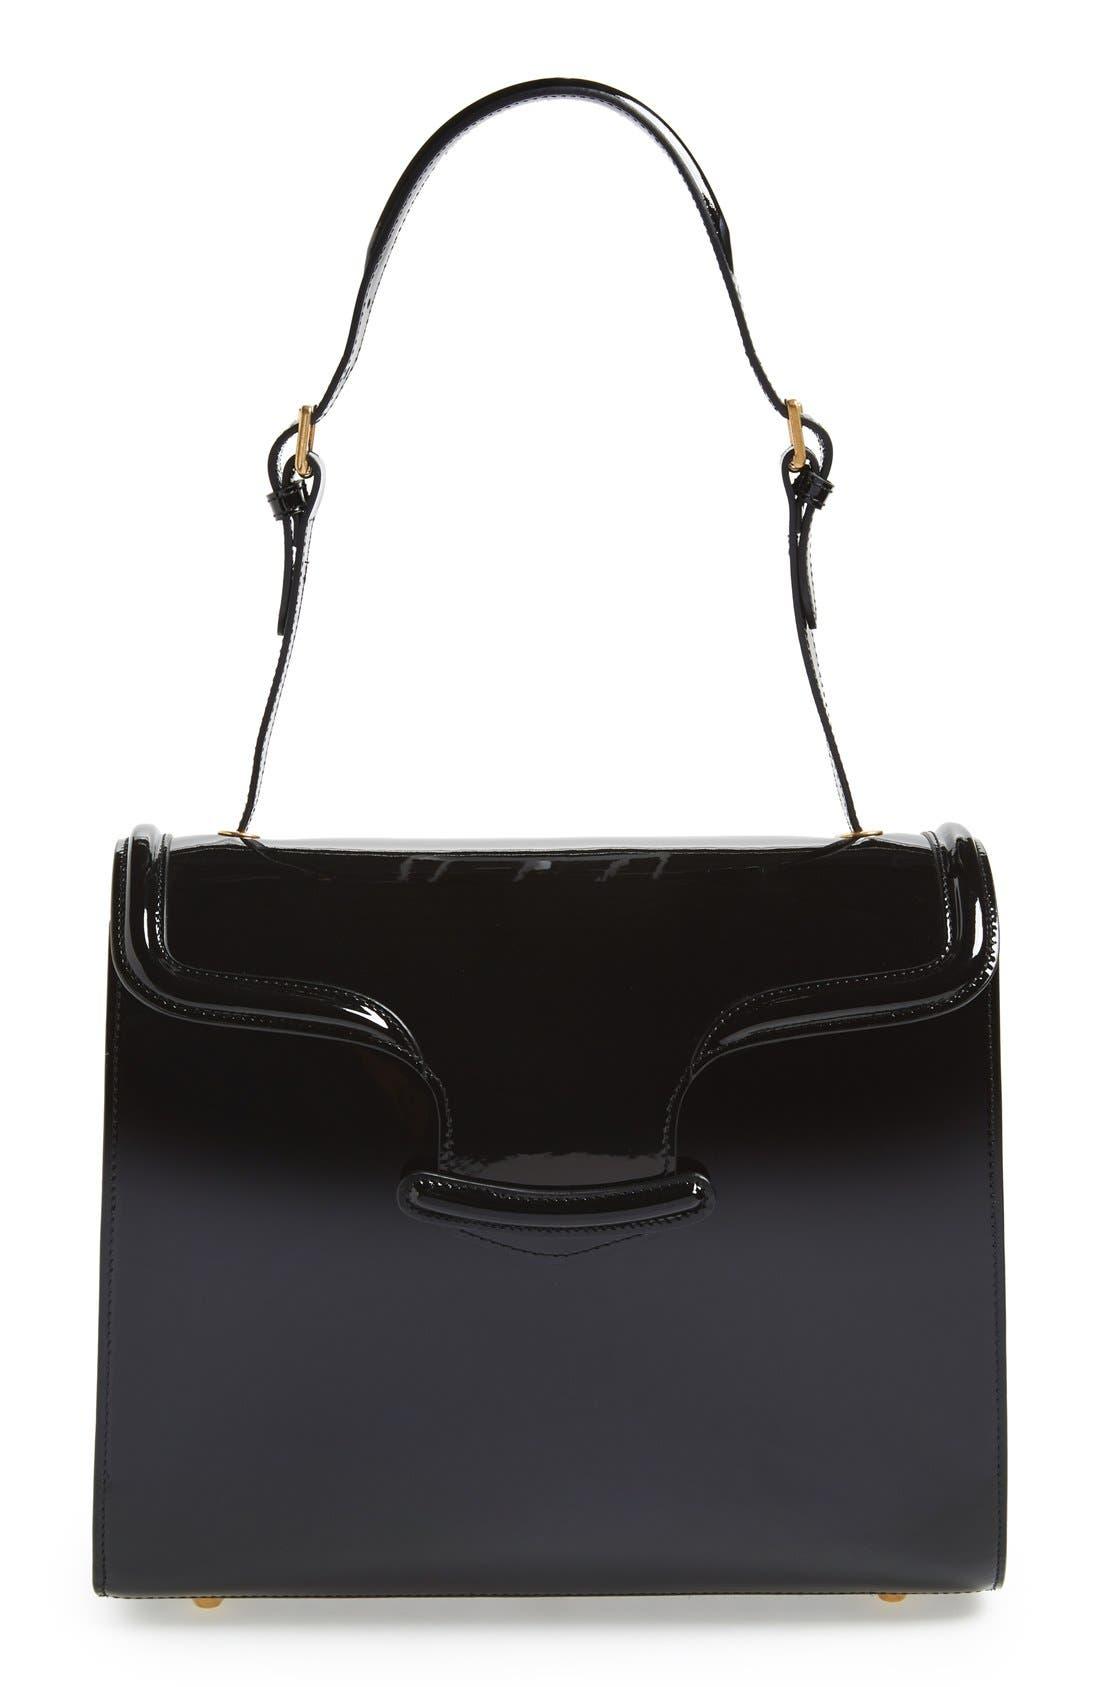 Main Image - Alexander McQueen 'Heroine' Patent Leather Shoulder Bag